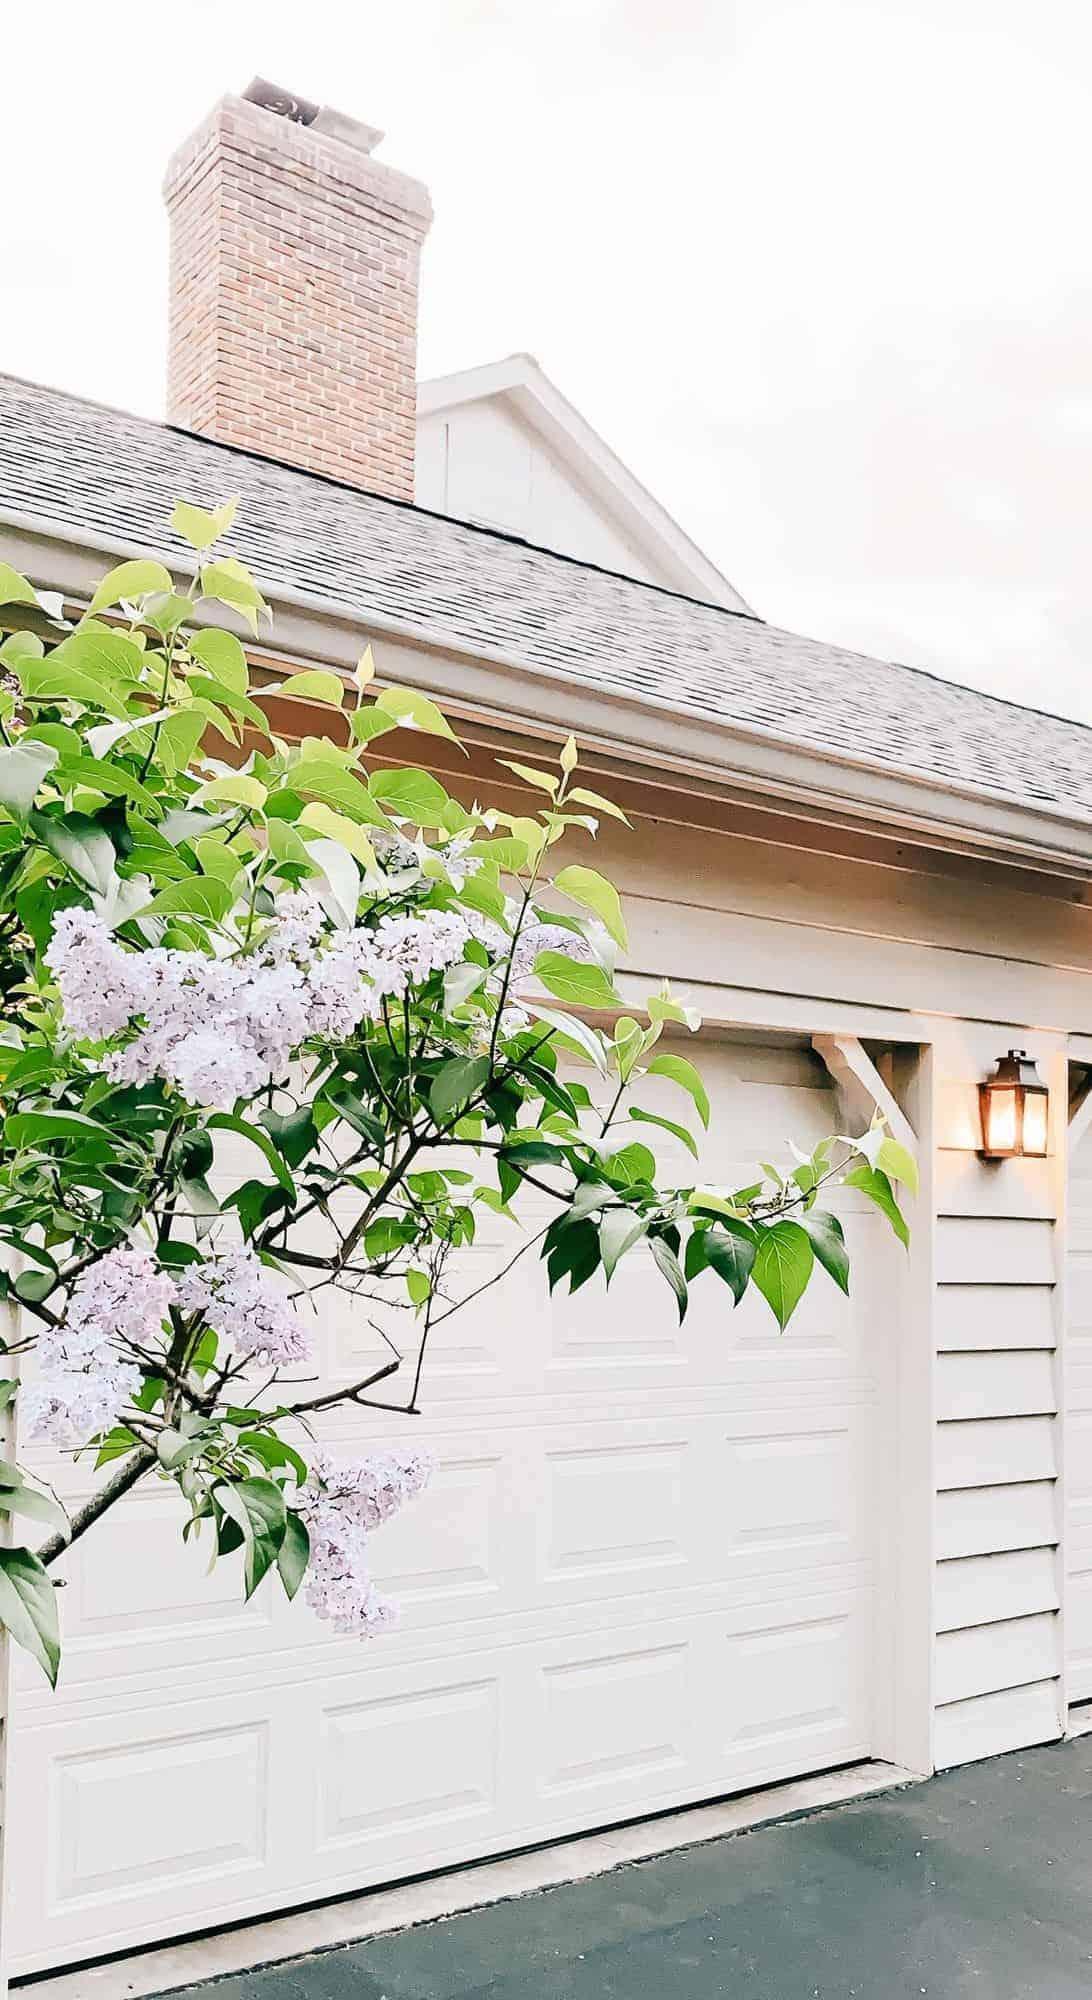 An exterior of a home with a copper lantern near a garage door.